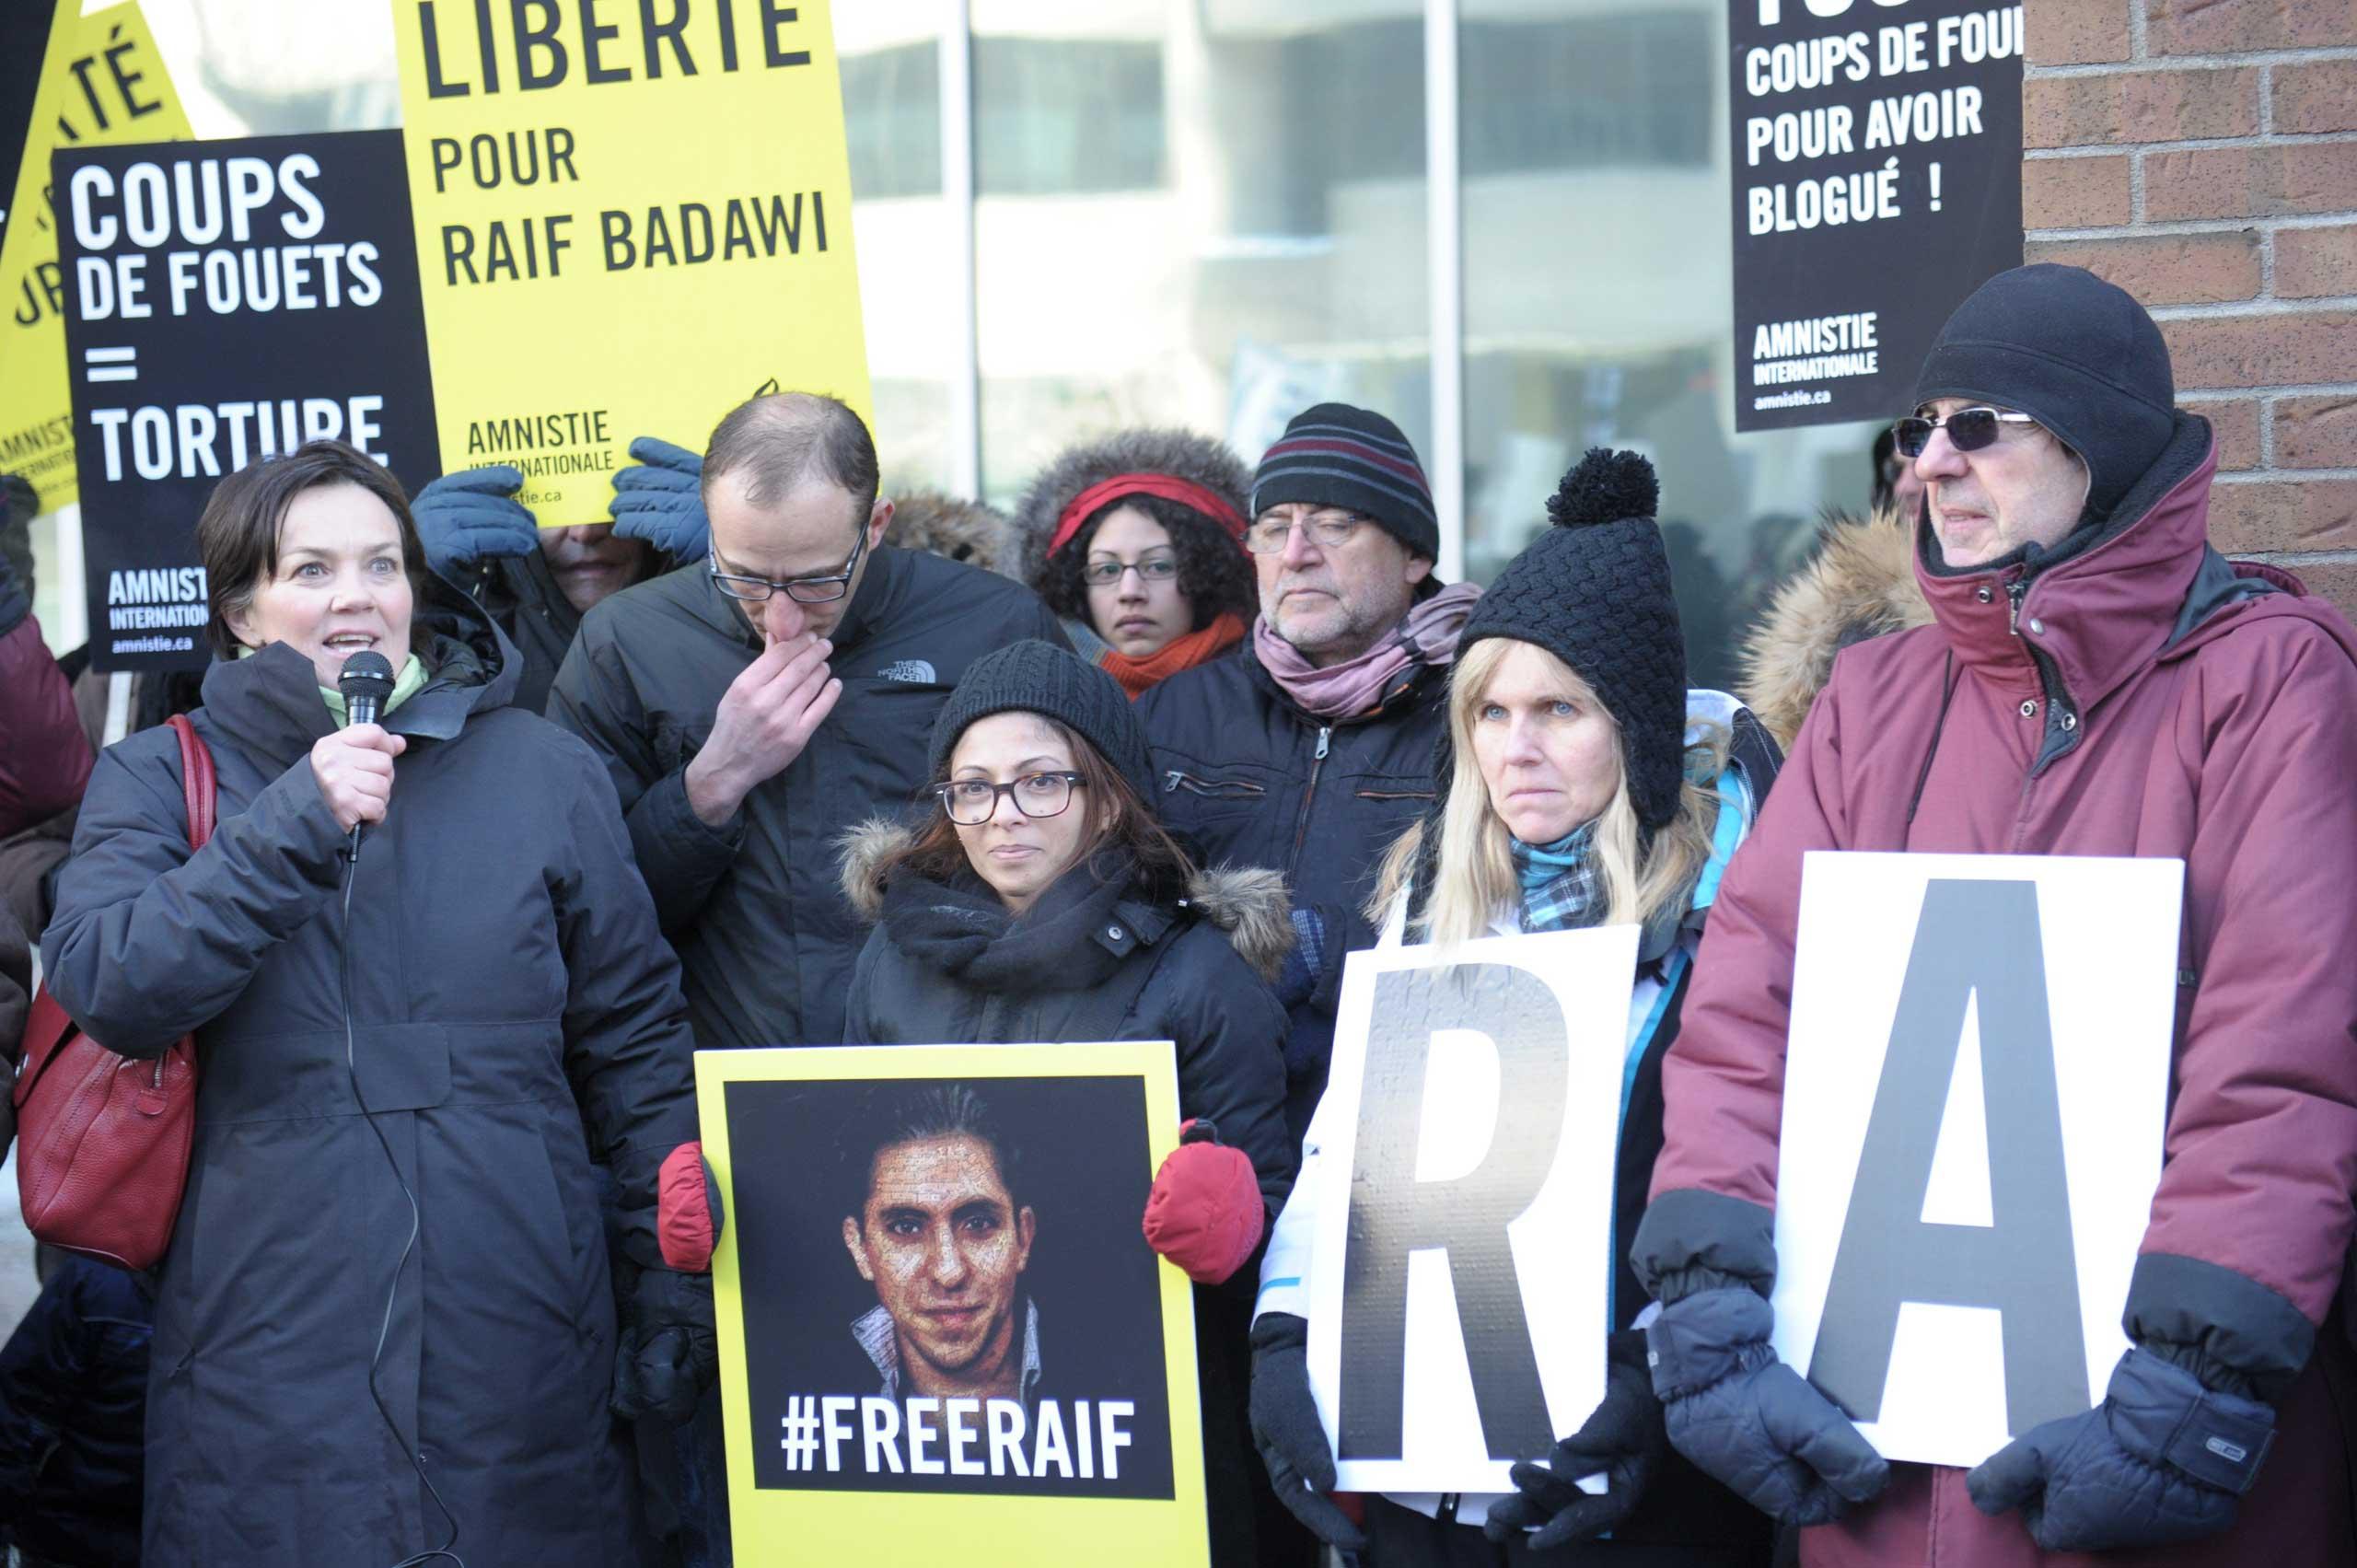 Ensaf Haidar (C), the wife of the Saudi Blogger Raif Badawi, holds a vigil urging Saudi Arabia to free her husband in Montreal on Jan. 13, 2015.